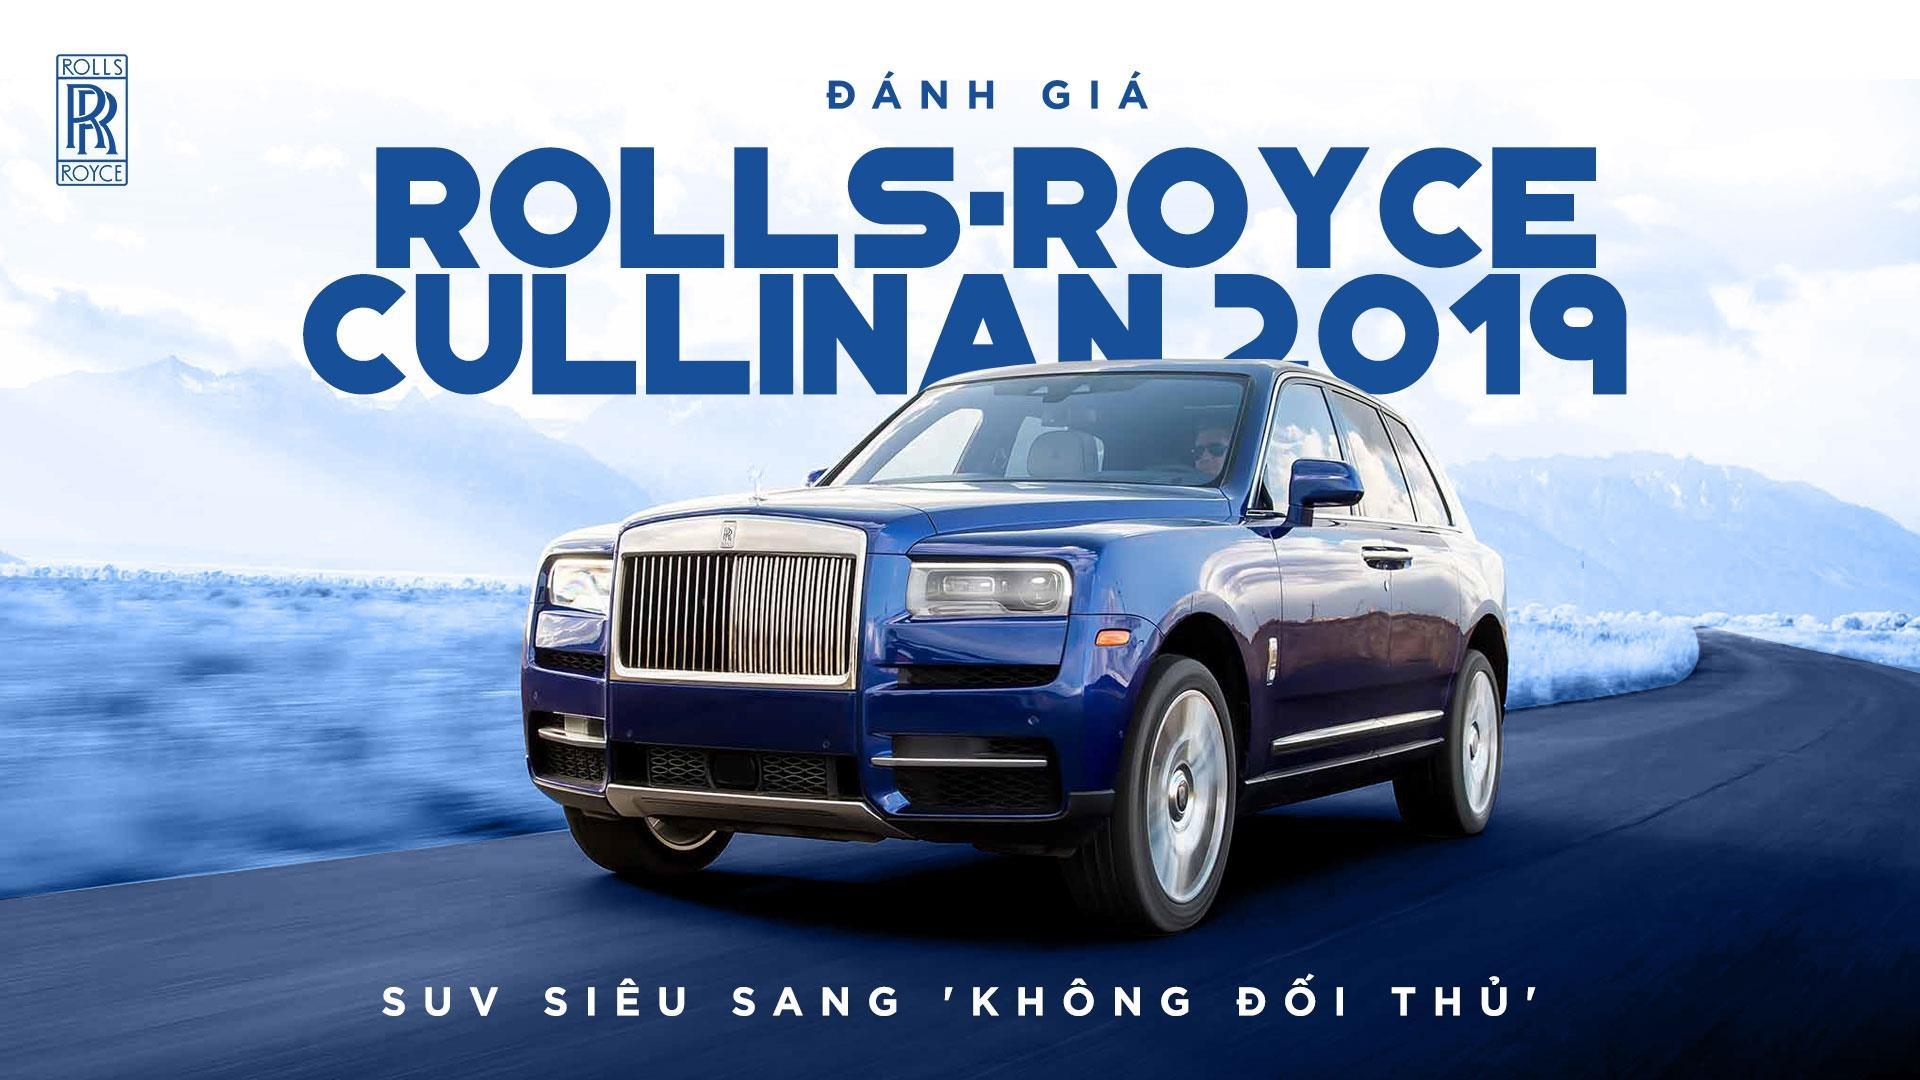 danh gia Rolls-Royce Cullinan anh 2